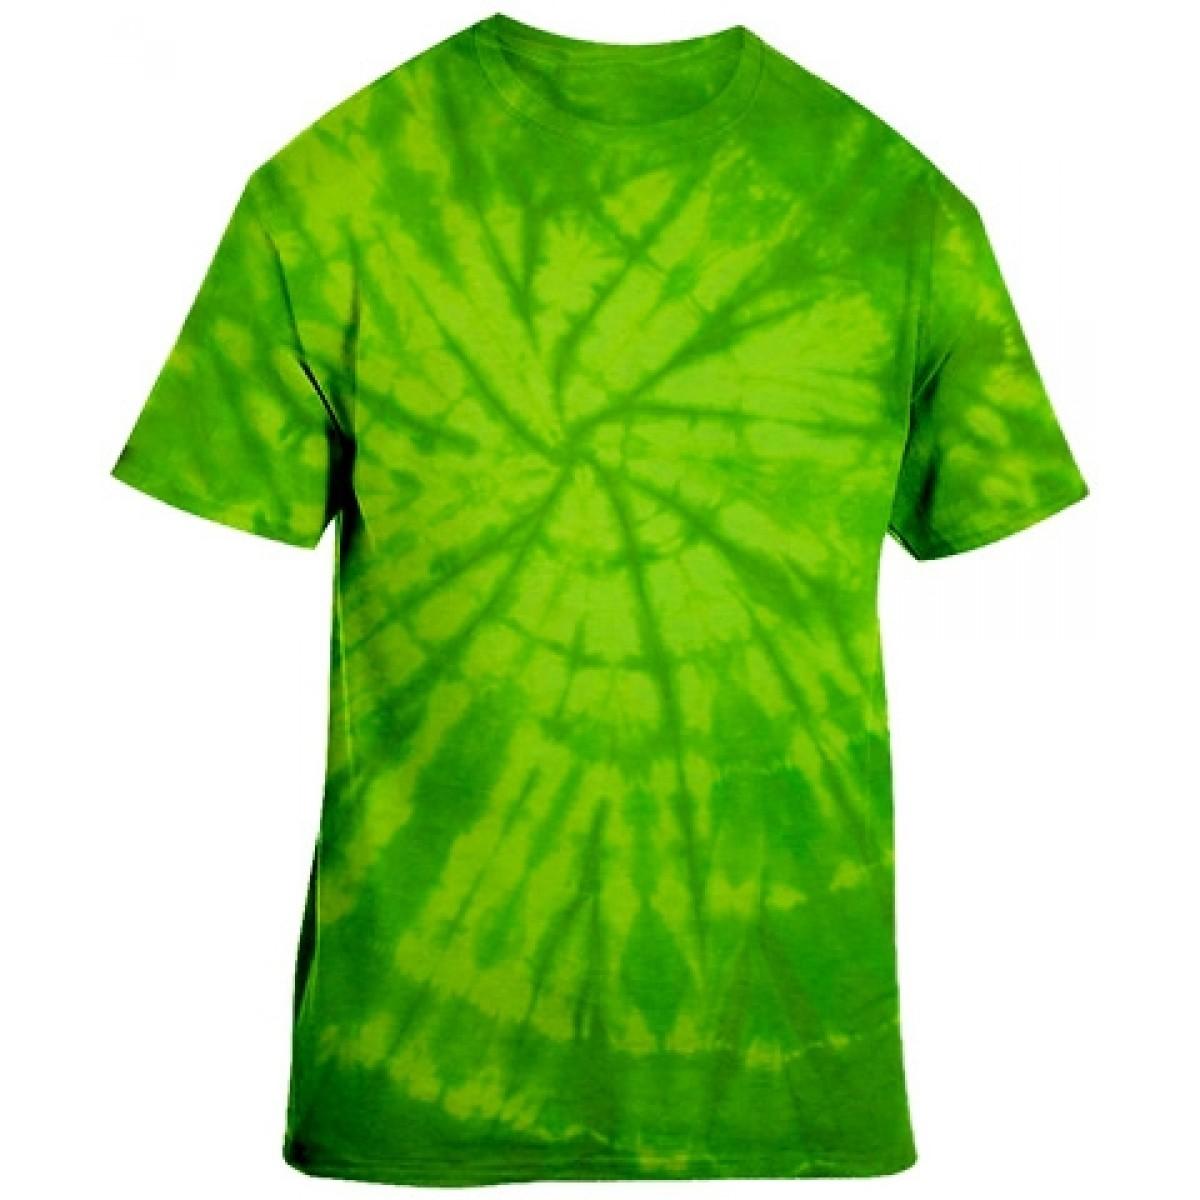 Tie-Dye Neon Green Short Sleeve-Neon Green-2XL